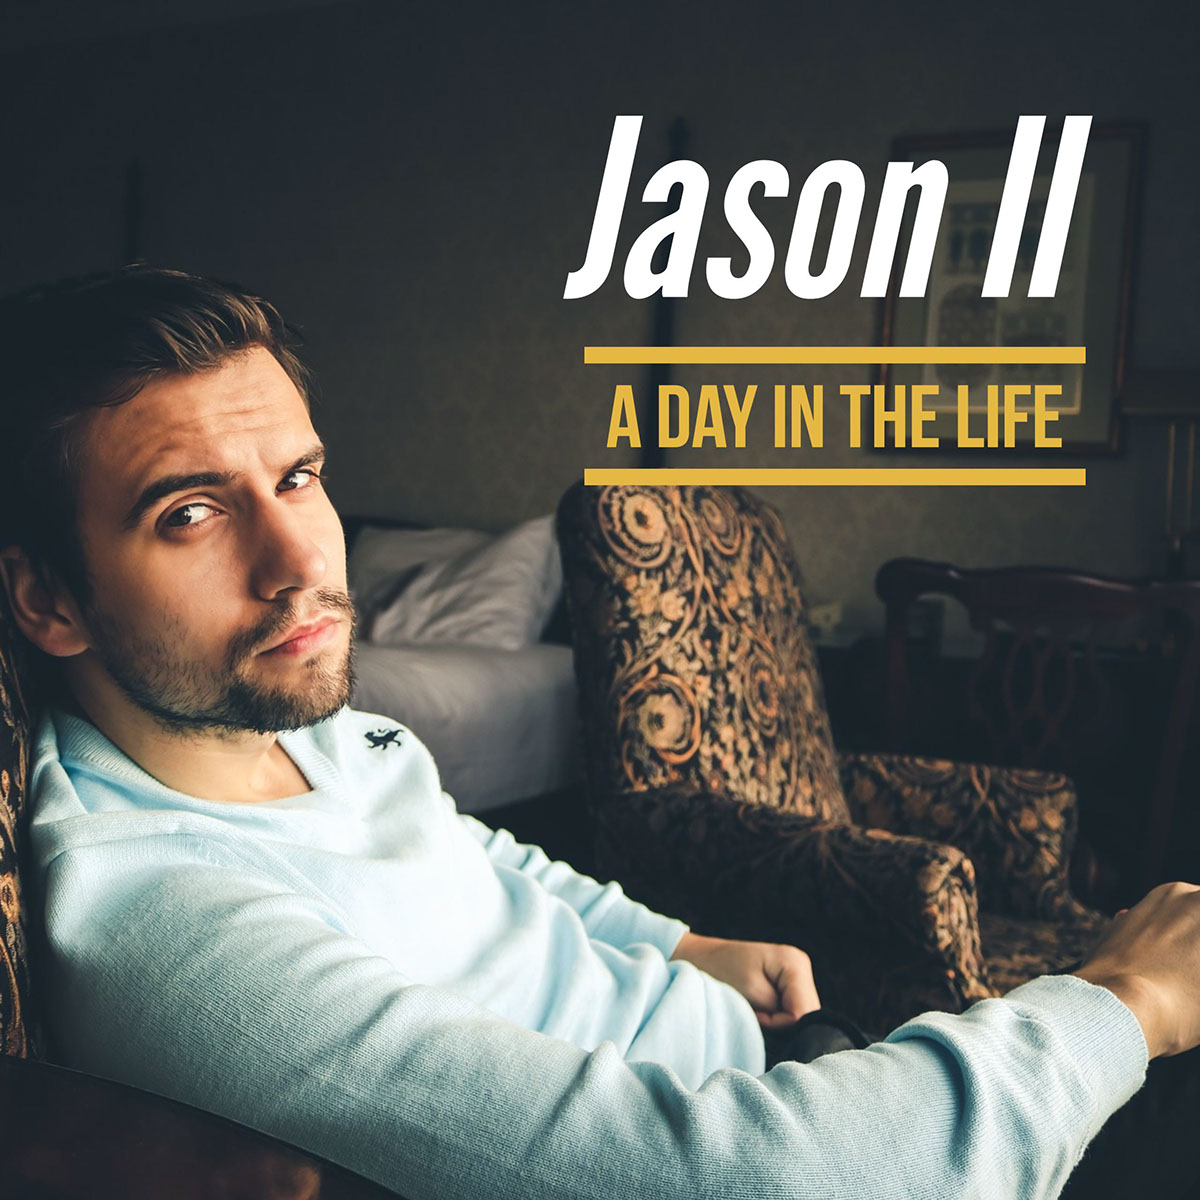 Jason II